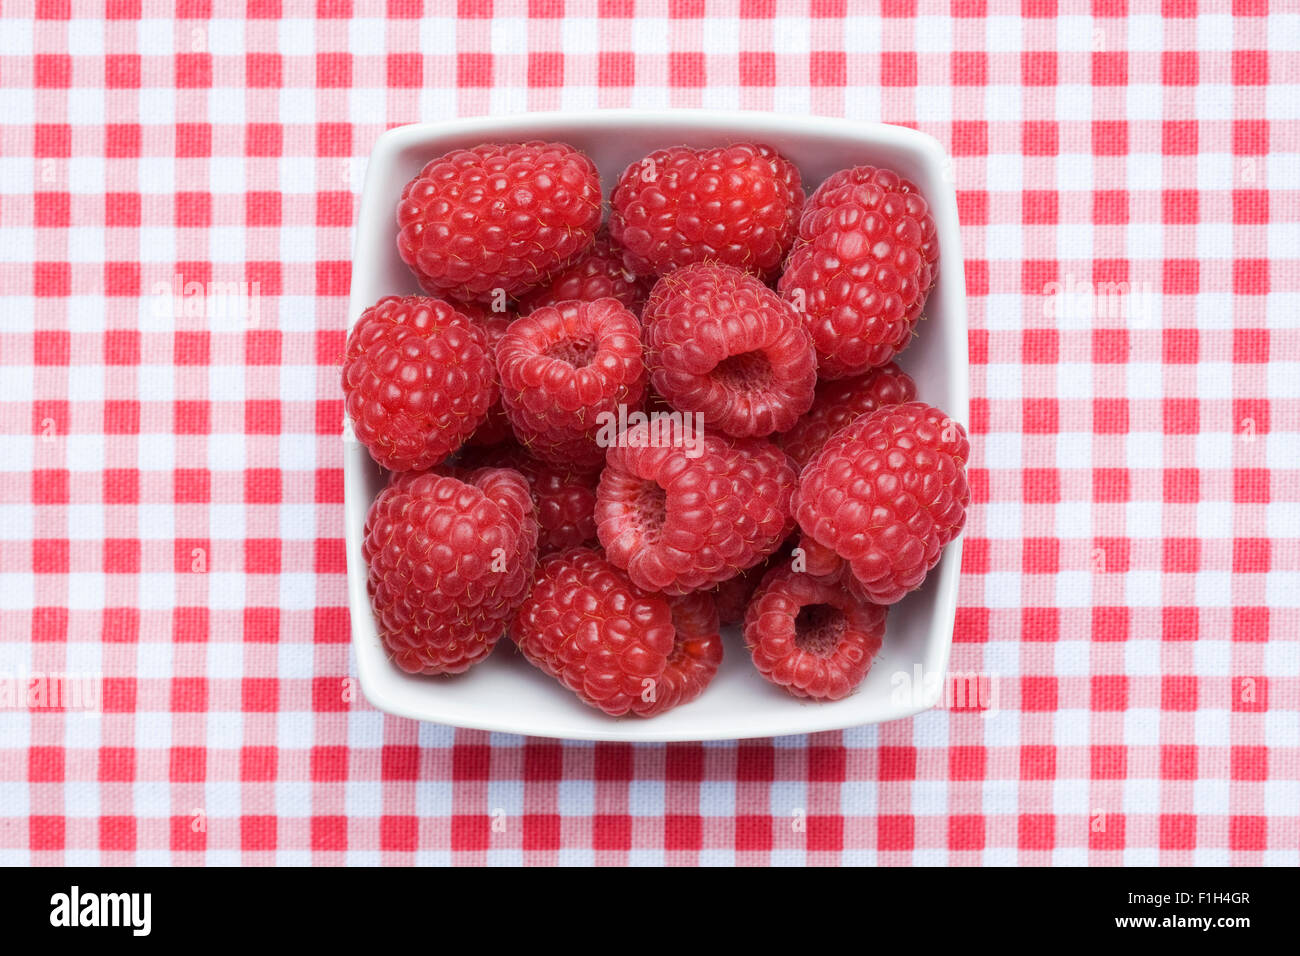 Rubus idaeus 'Autumn Bliss'. Freshly picked raspberries. - Stock Image